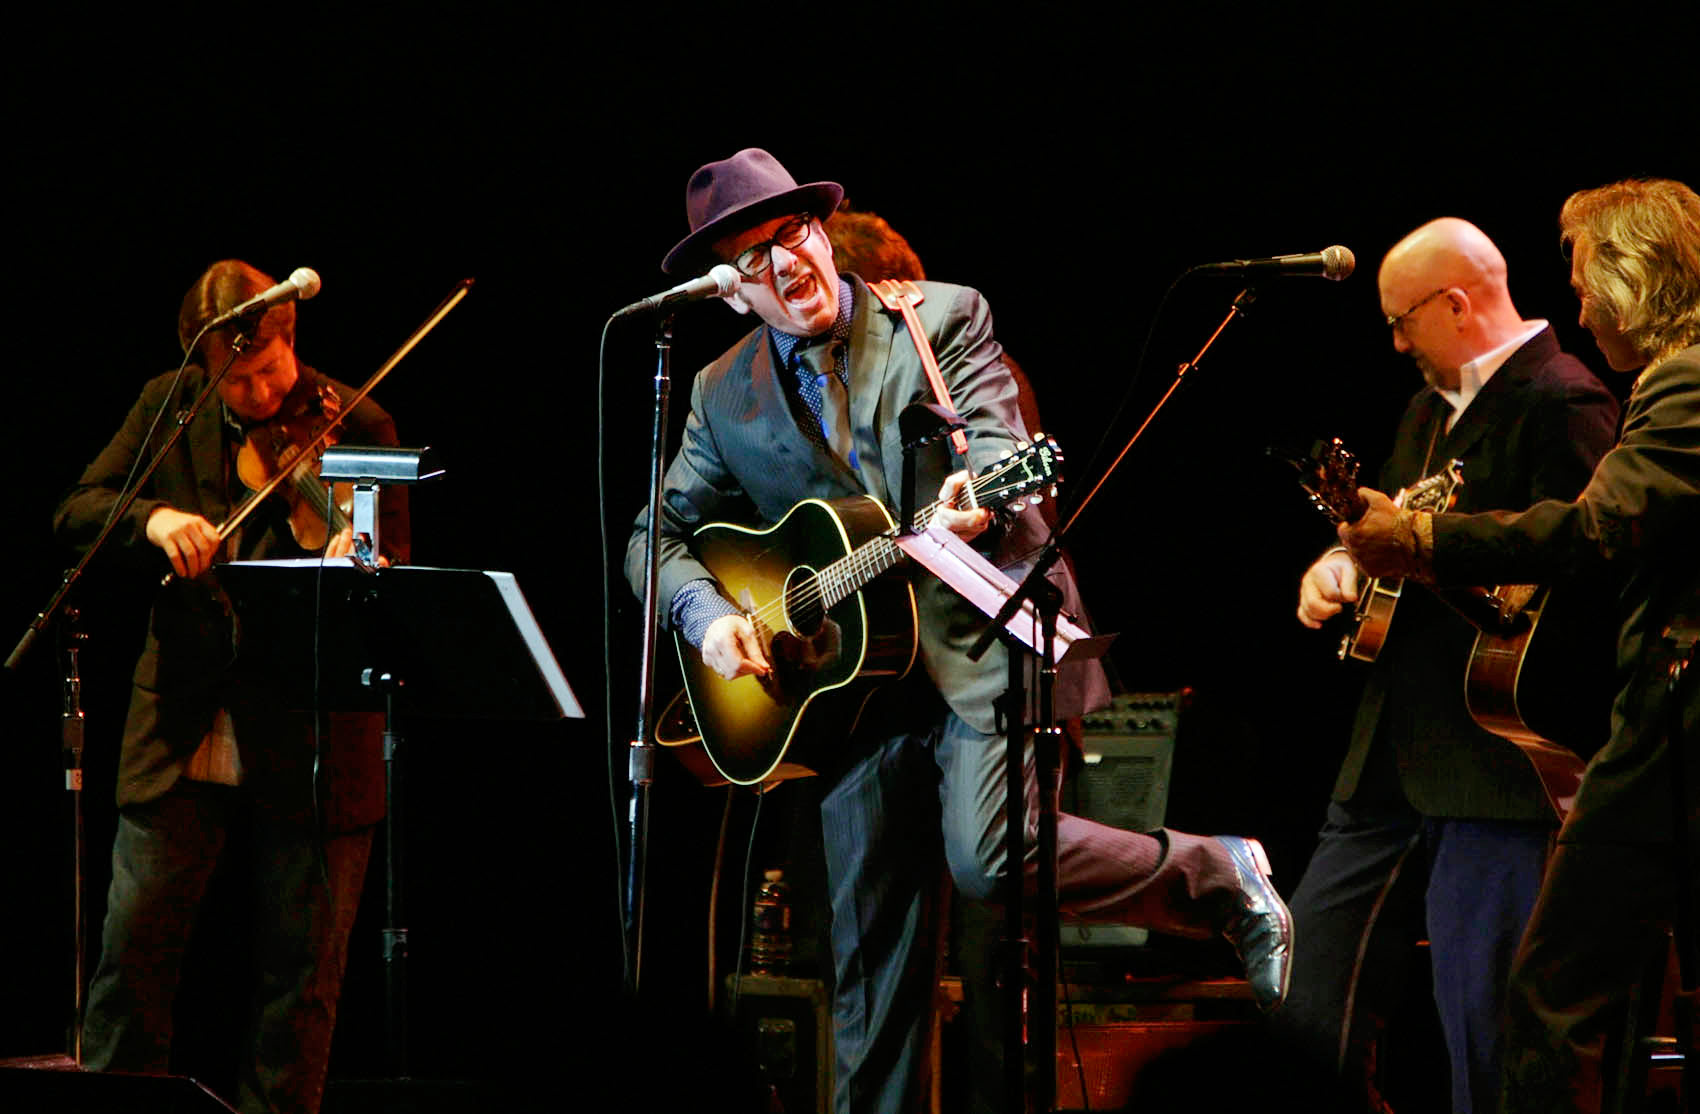 Elvis Costello & The Sugarcanes